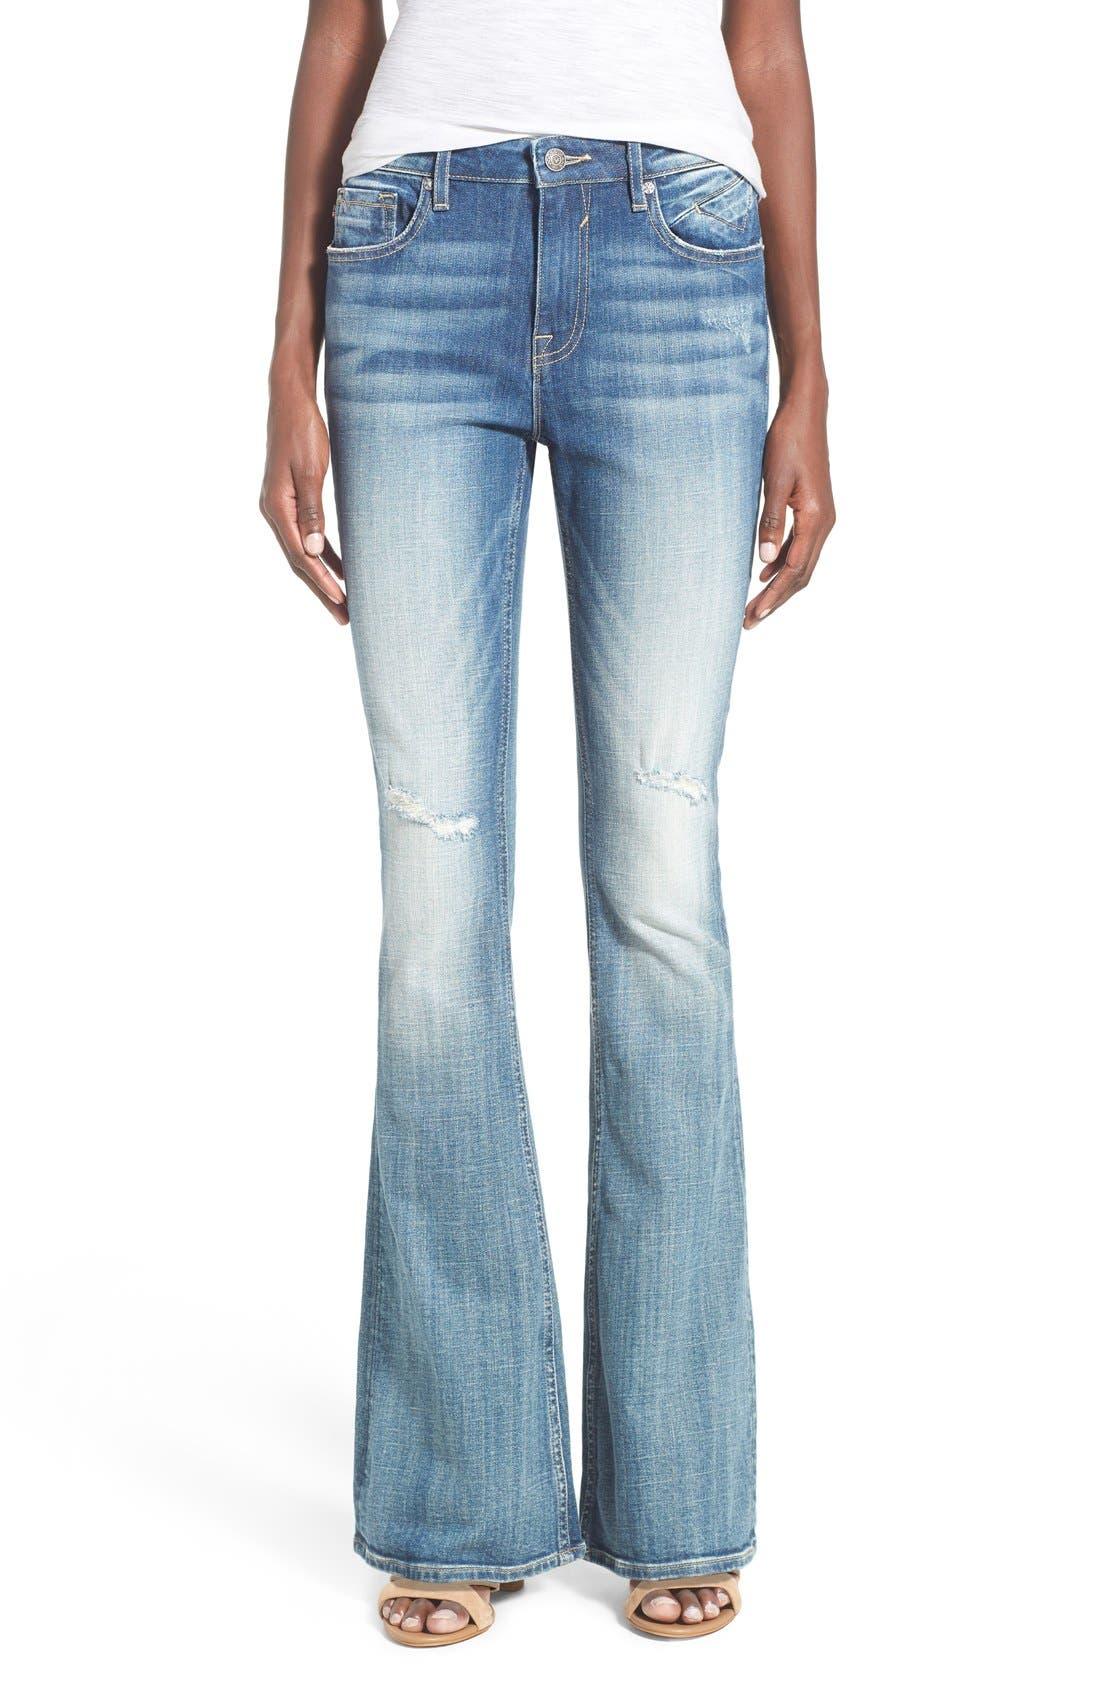 Alternate Image 1 Selected - Vigoss 'Chelsea' Flare Jeans (Medium Wash)